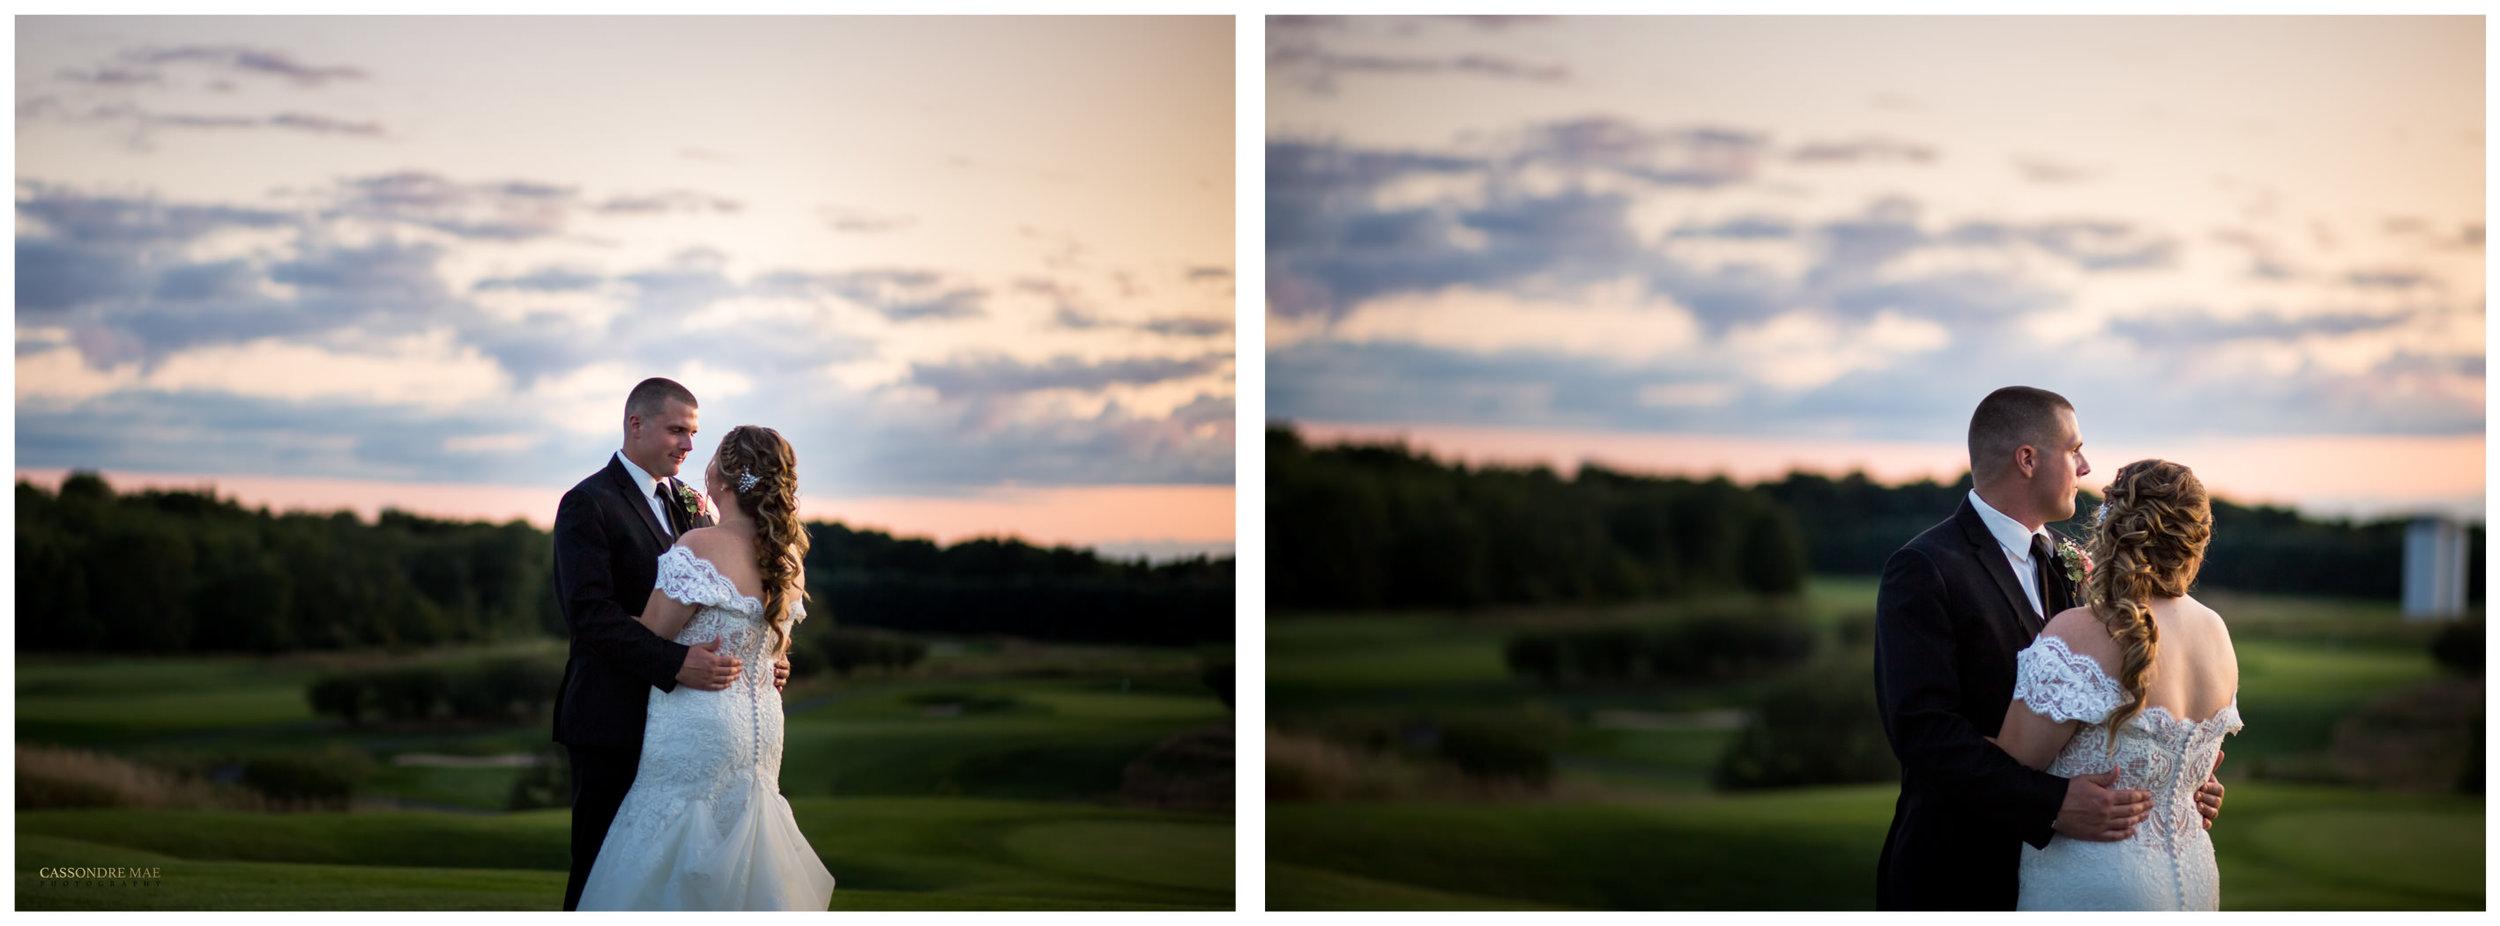 Cassondre Mae Photography Hudson Valley Wedding Photographer 12.jpg